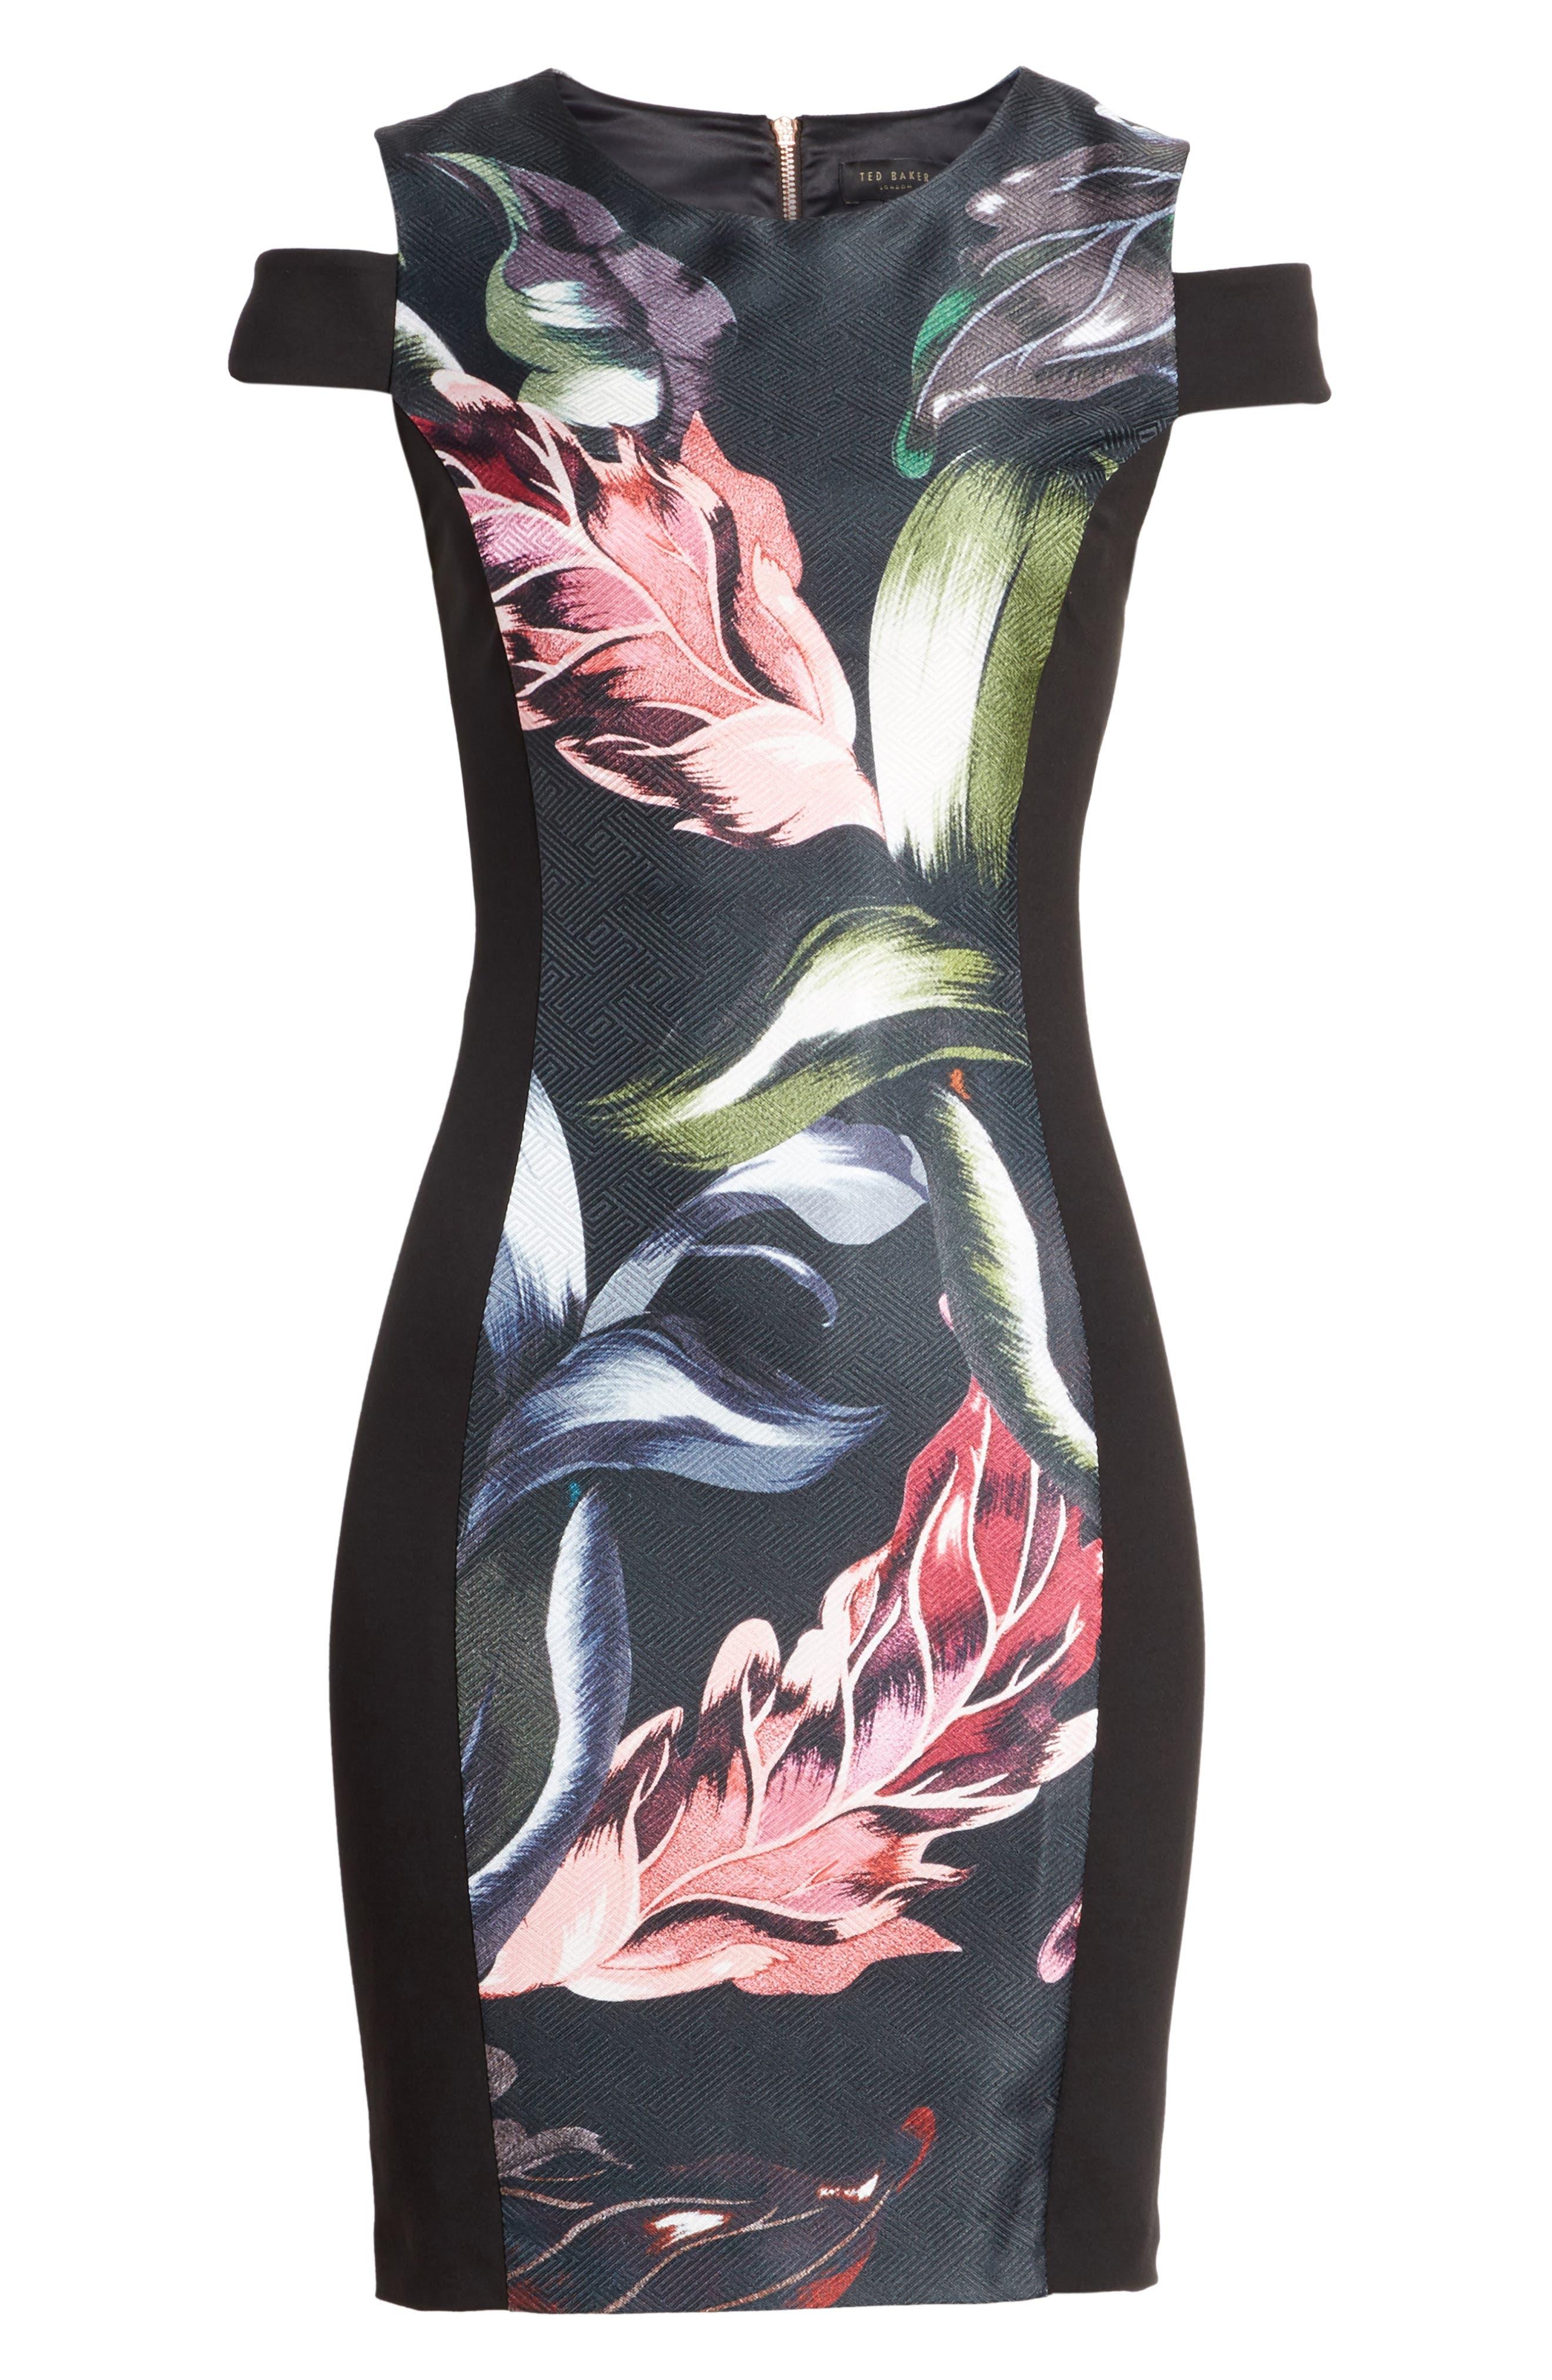 Leeash Eden Body Con Dress,                             Alternate thumbnail 6, color,                             Black